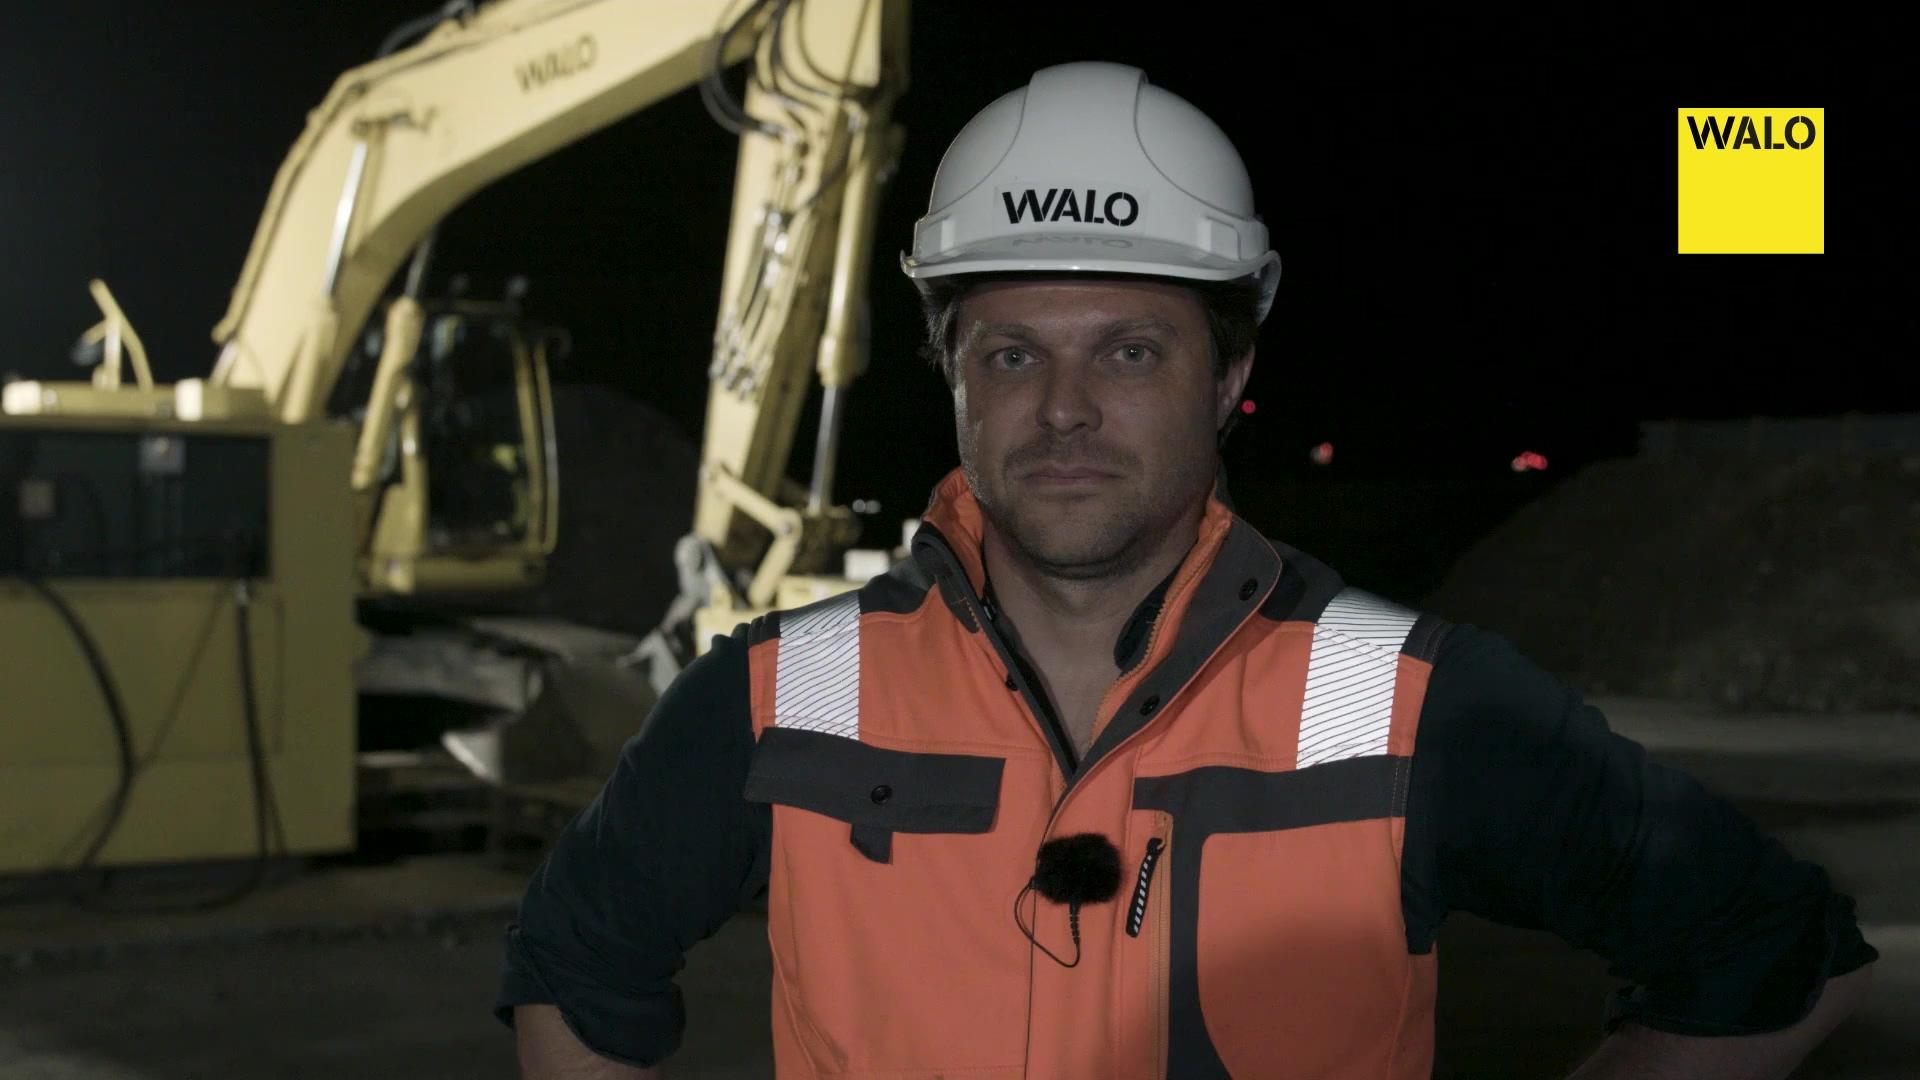 WALO_Employer Branding_Tobias Frick